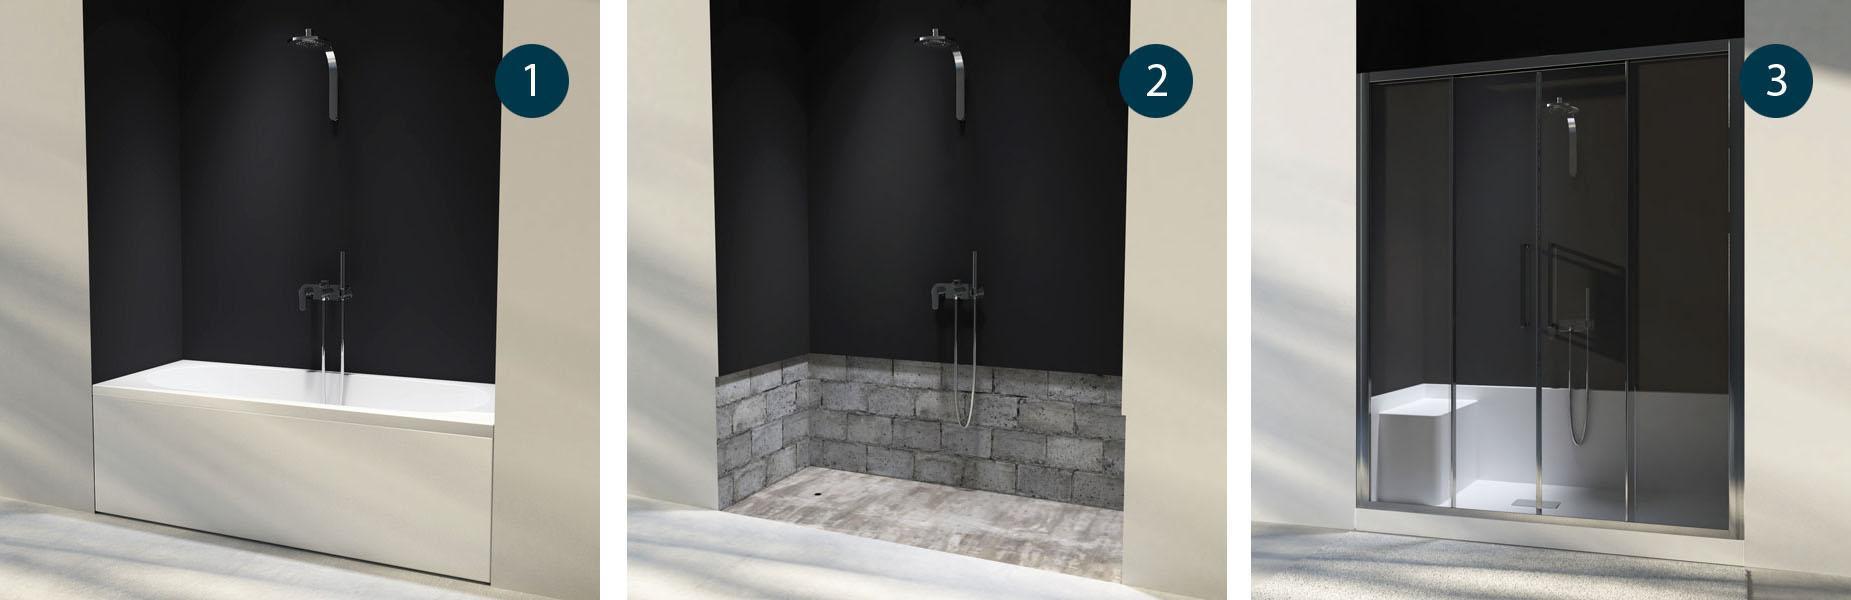 Docce per anziani e disabili sostituzione vasca in doccia - Da vasca da bagno a doccia ...